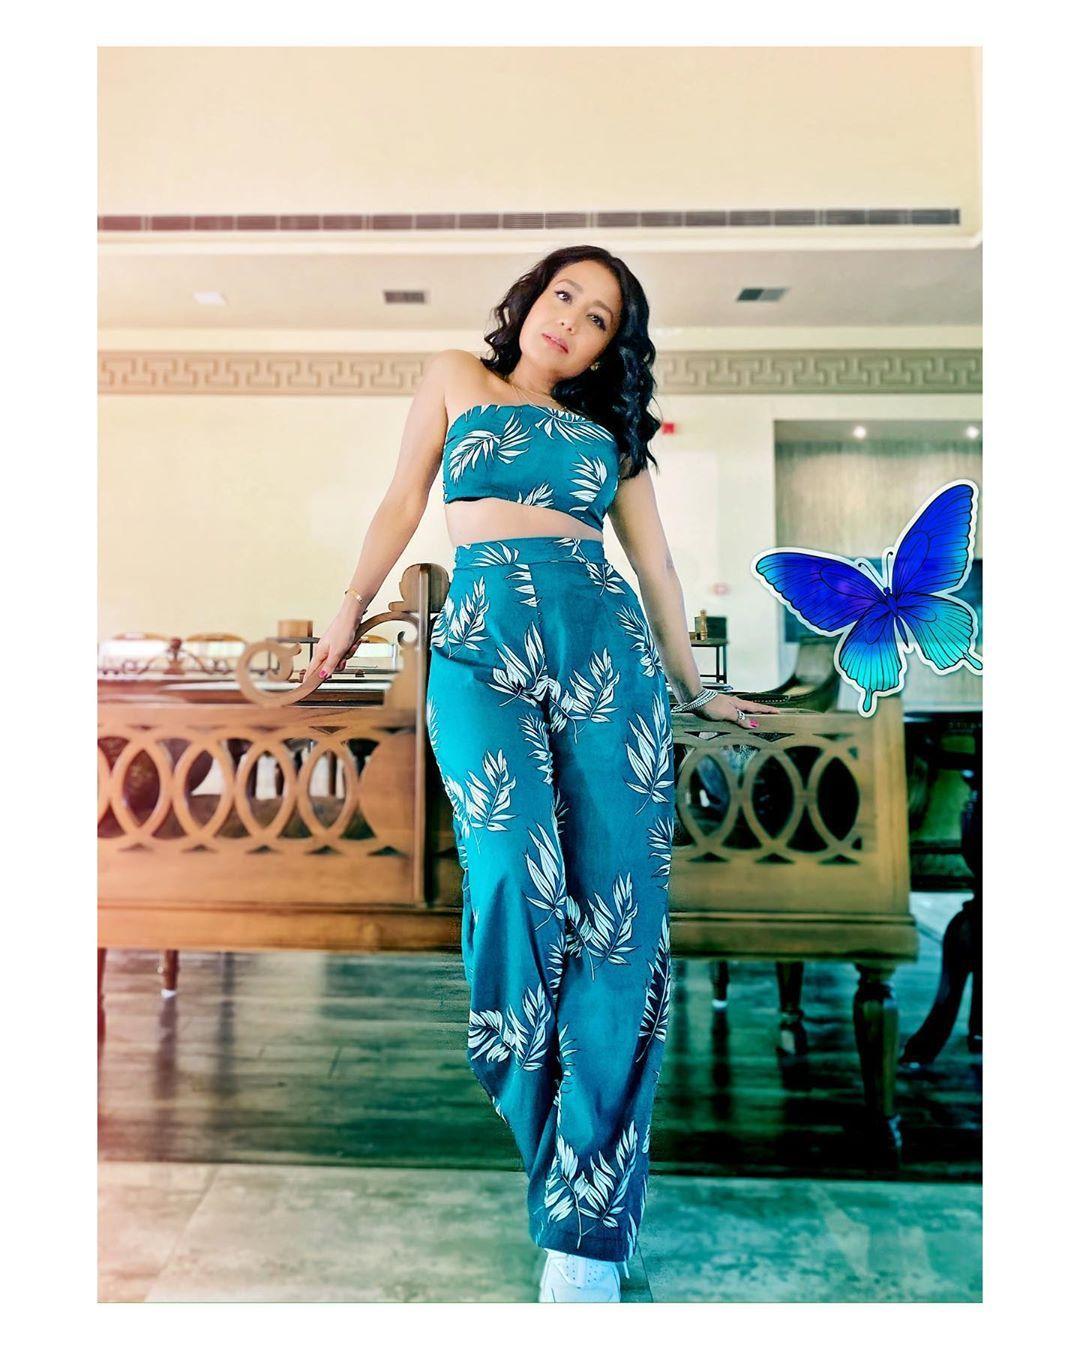 Neha Kakkar On Instagram My Puchda Hi Nahin Look Outfit Shopstyleash Muah Vibhagusain Stylebysuga In 2020 Selena Gomez Outfits Fashion Fashion Outfits